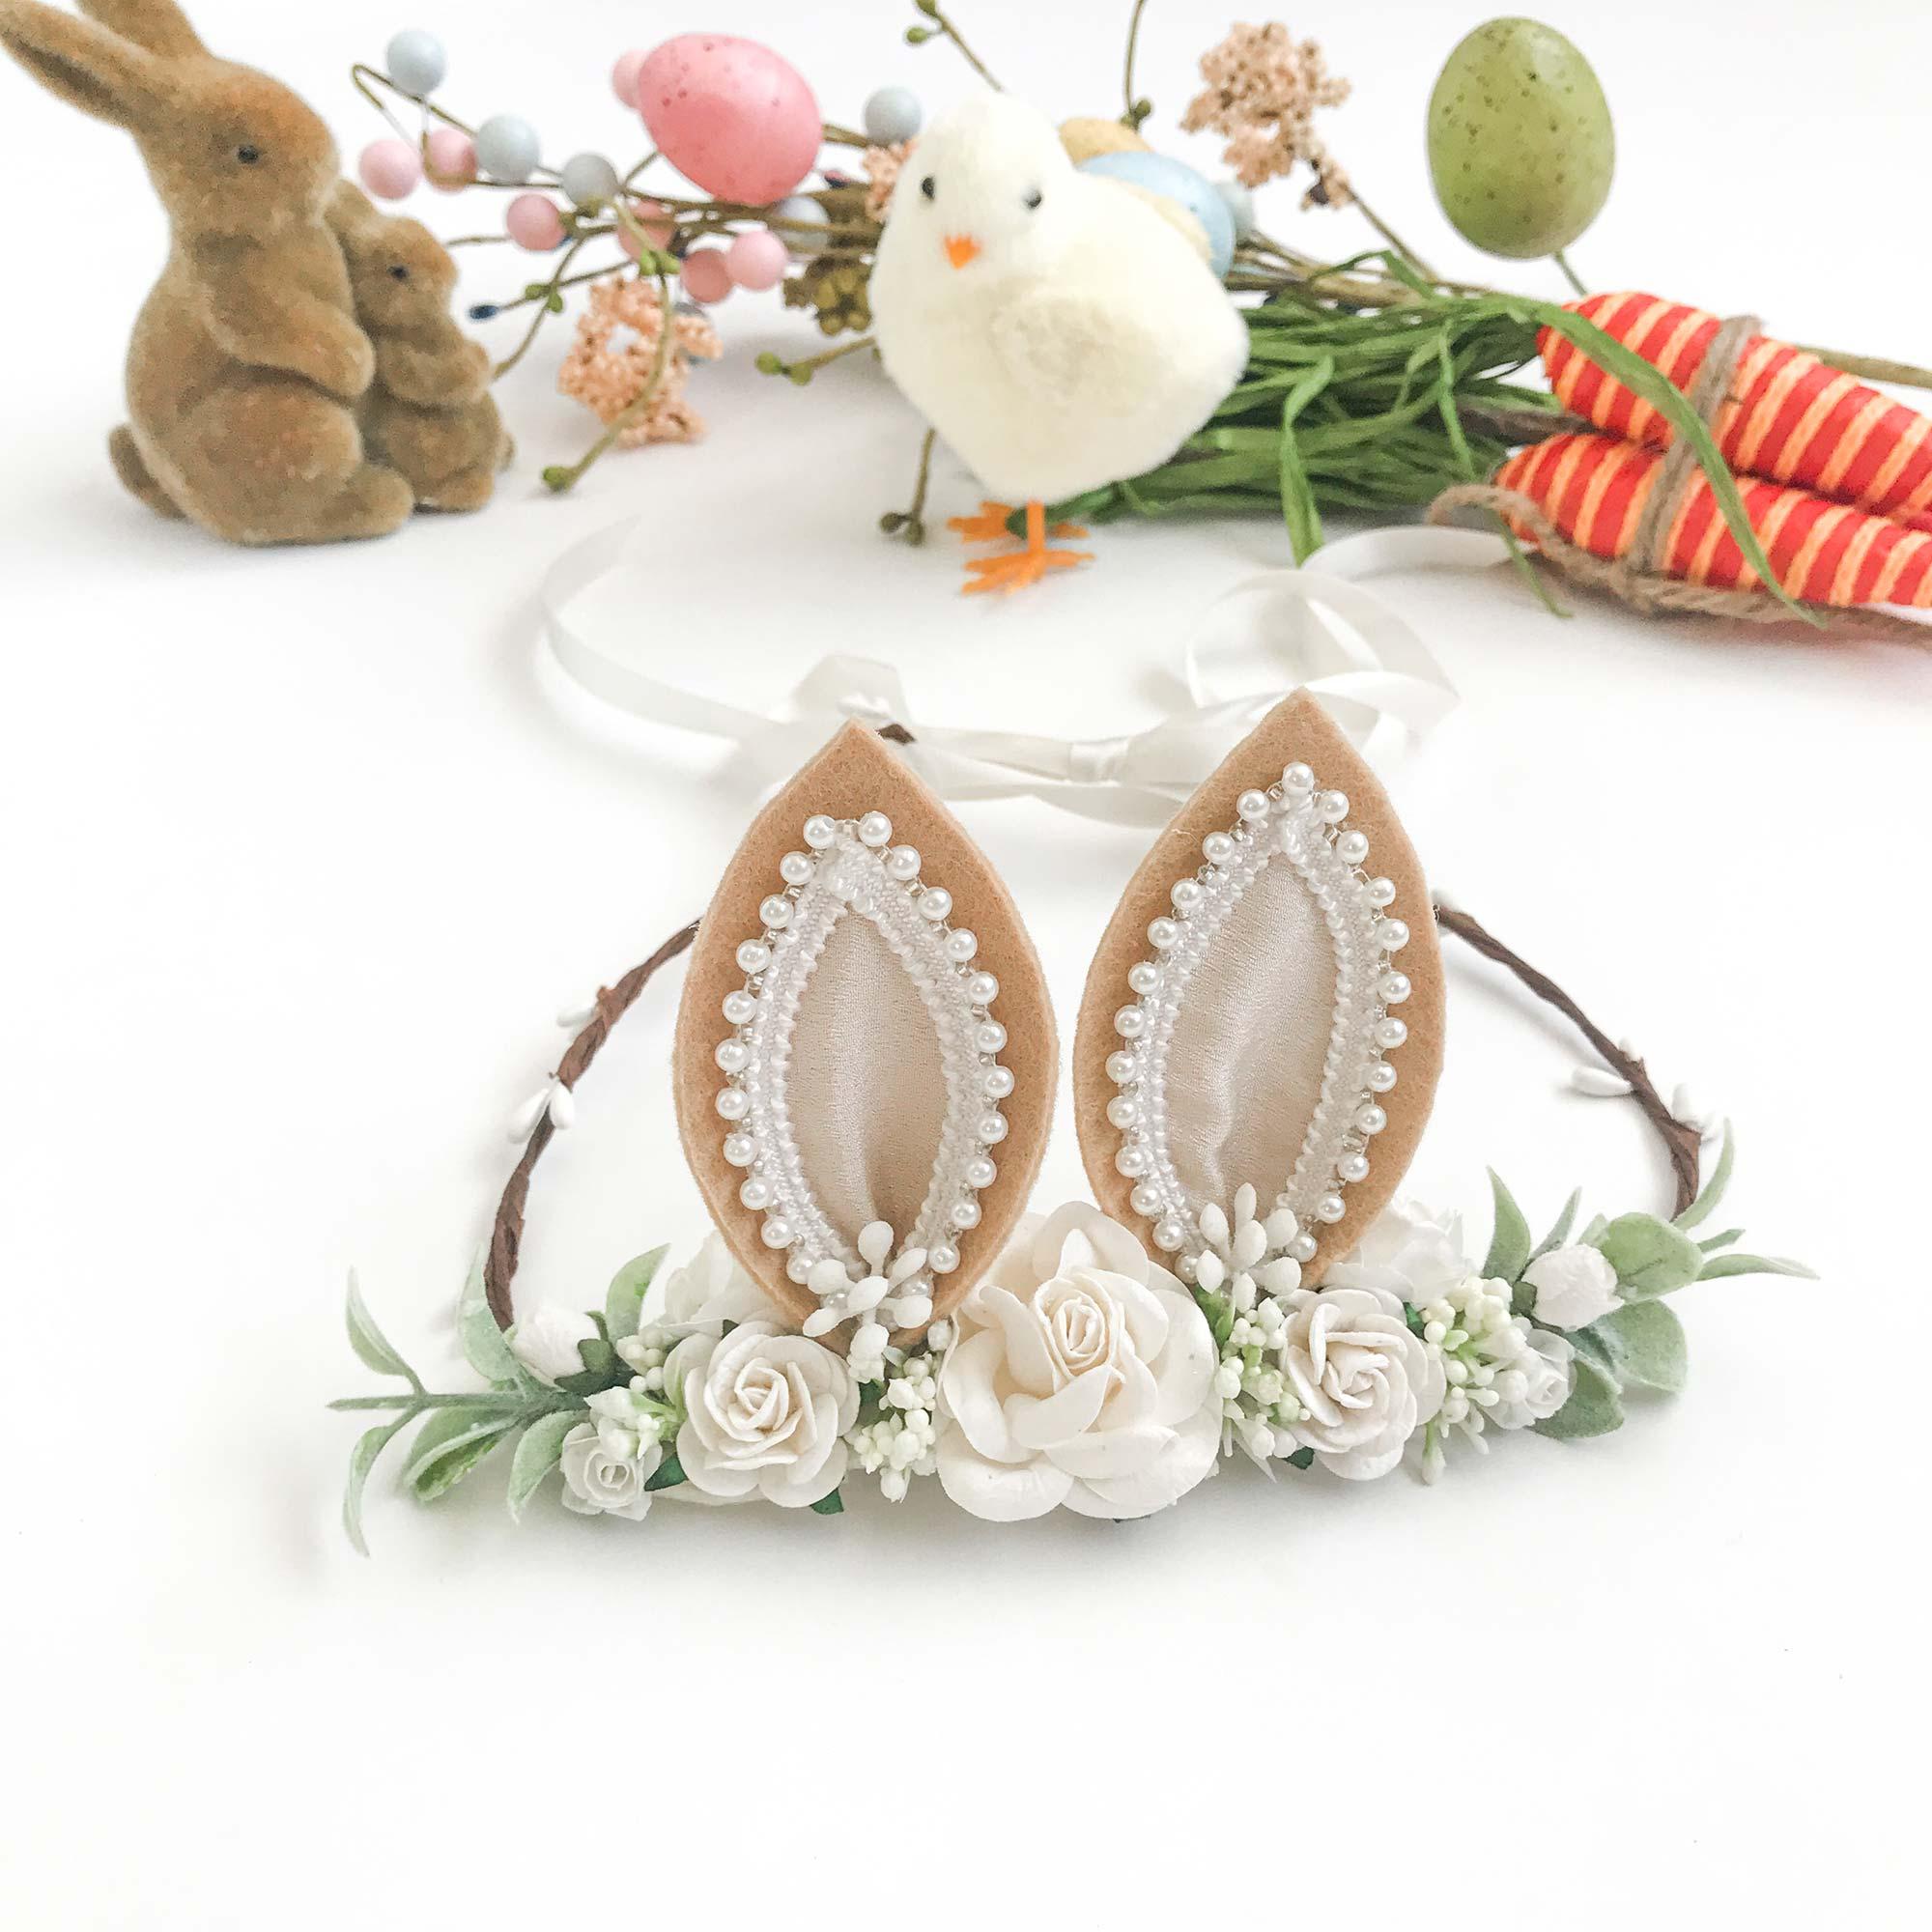 Cream Pearl Bunny Ears Garland